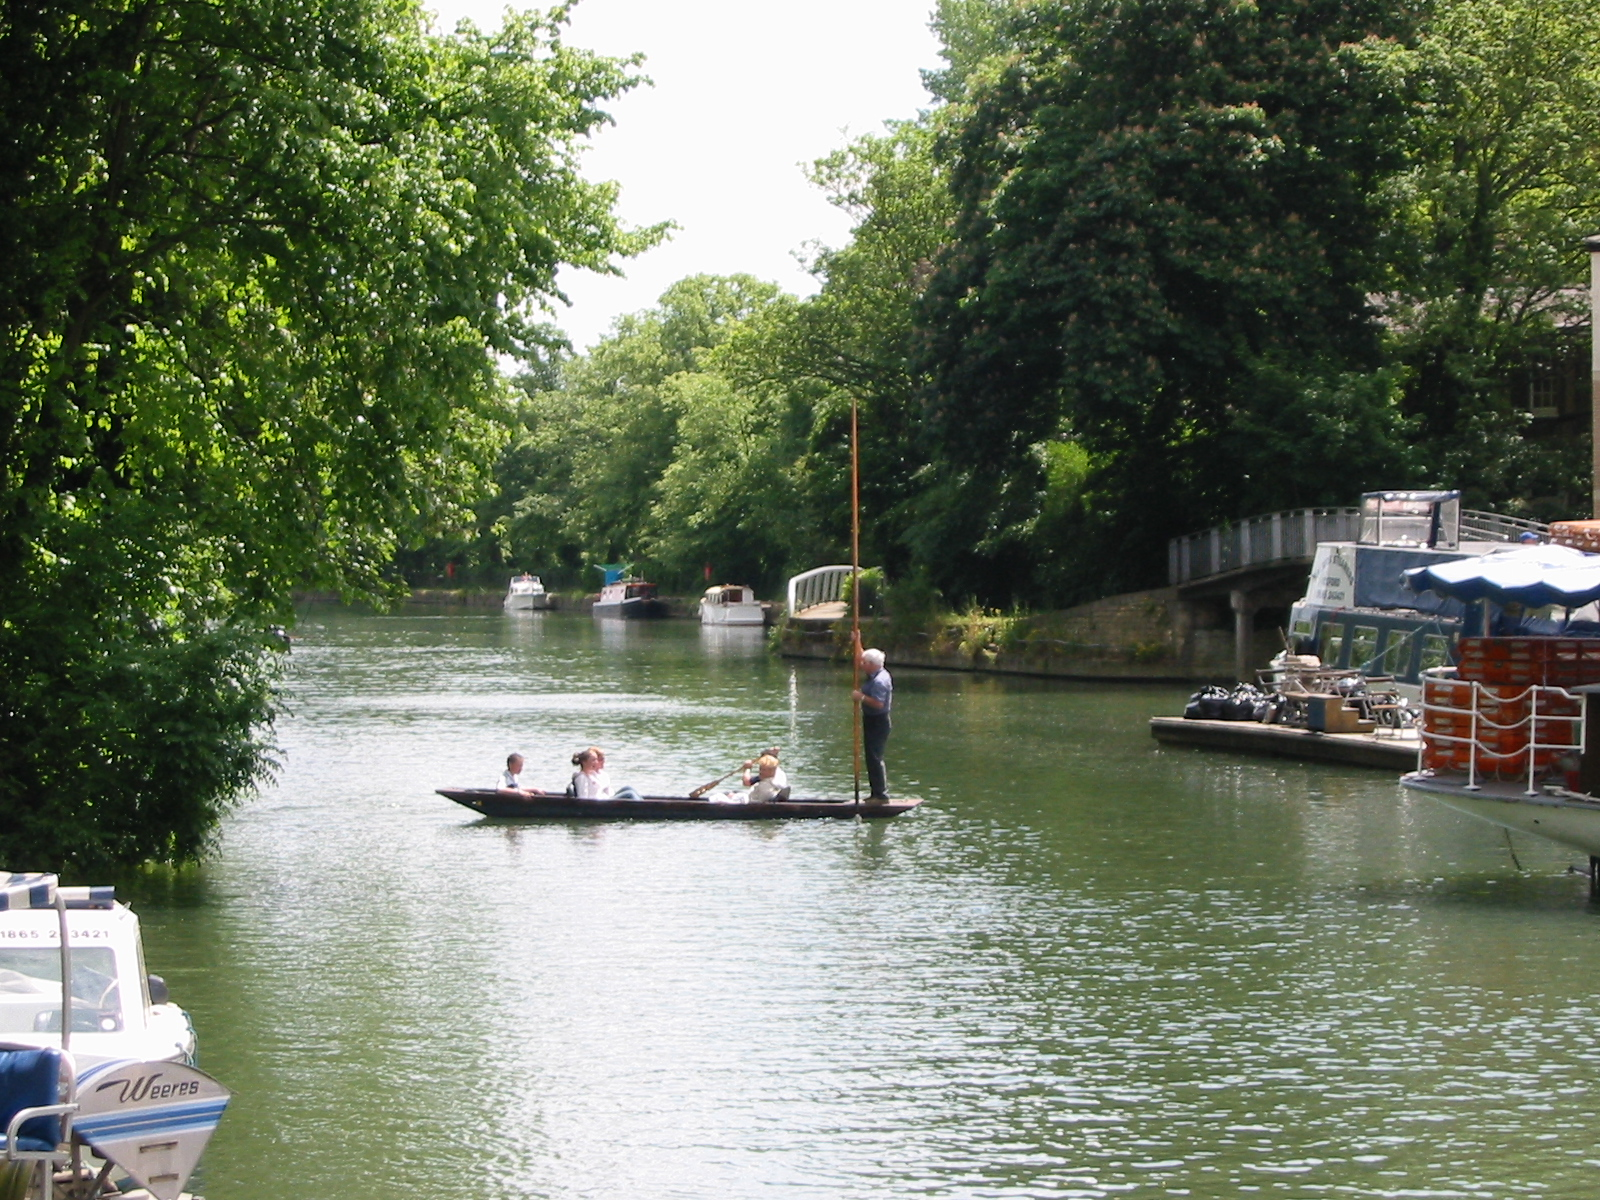 File:River thames oxford.jpg - Wikimedia Commons